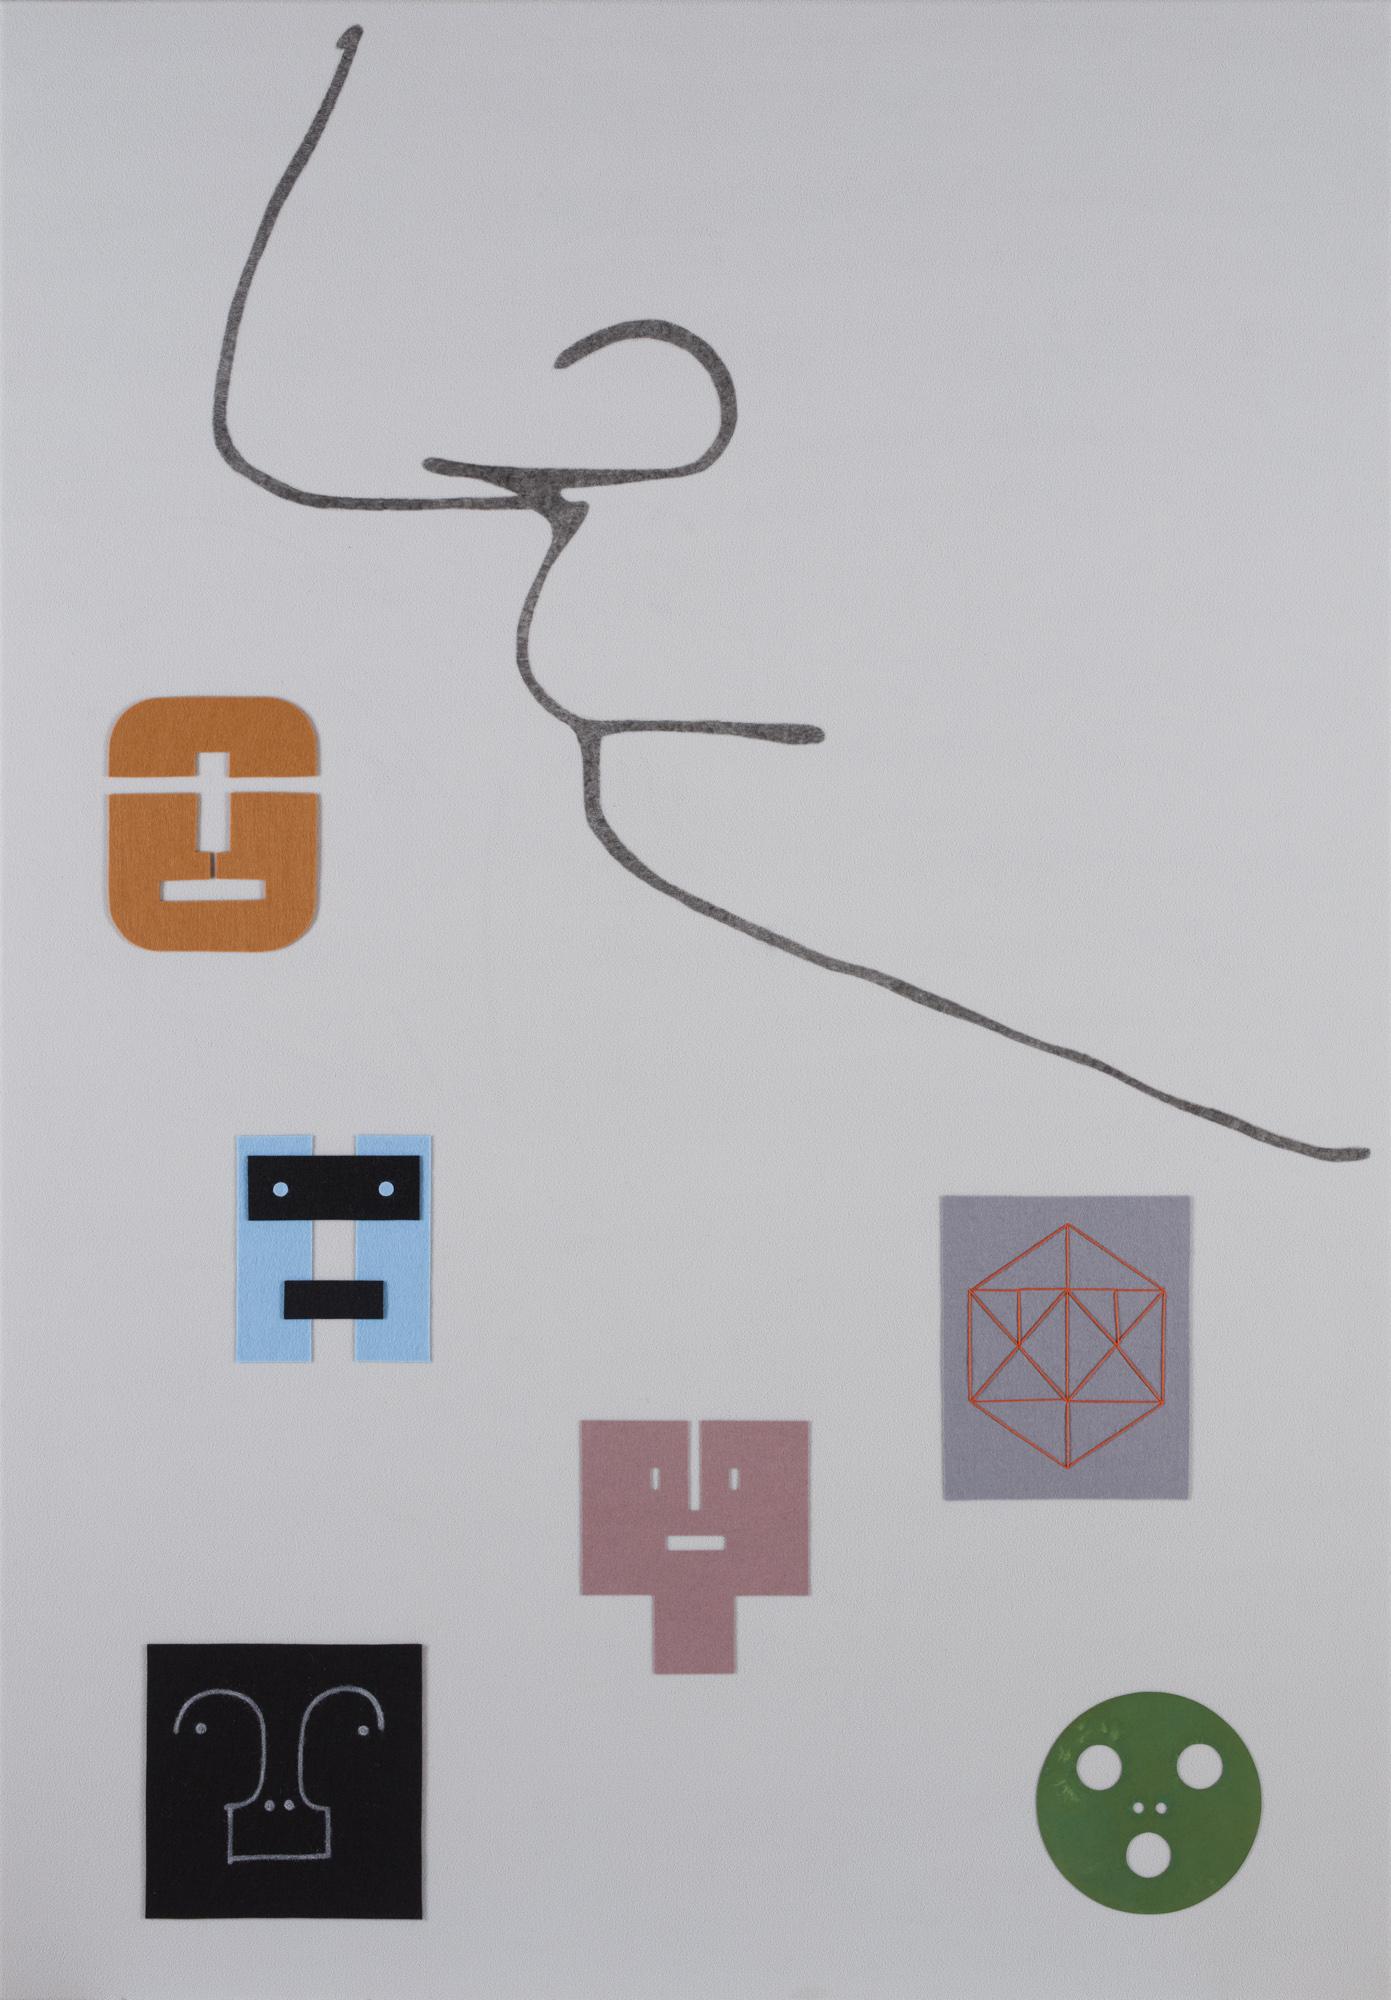 Norberg & Sundén  Faces  2018 Acrylic and collage on fleece 180 x 125 cm